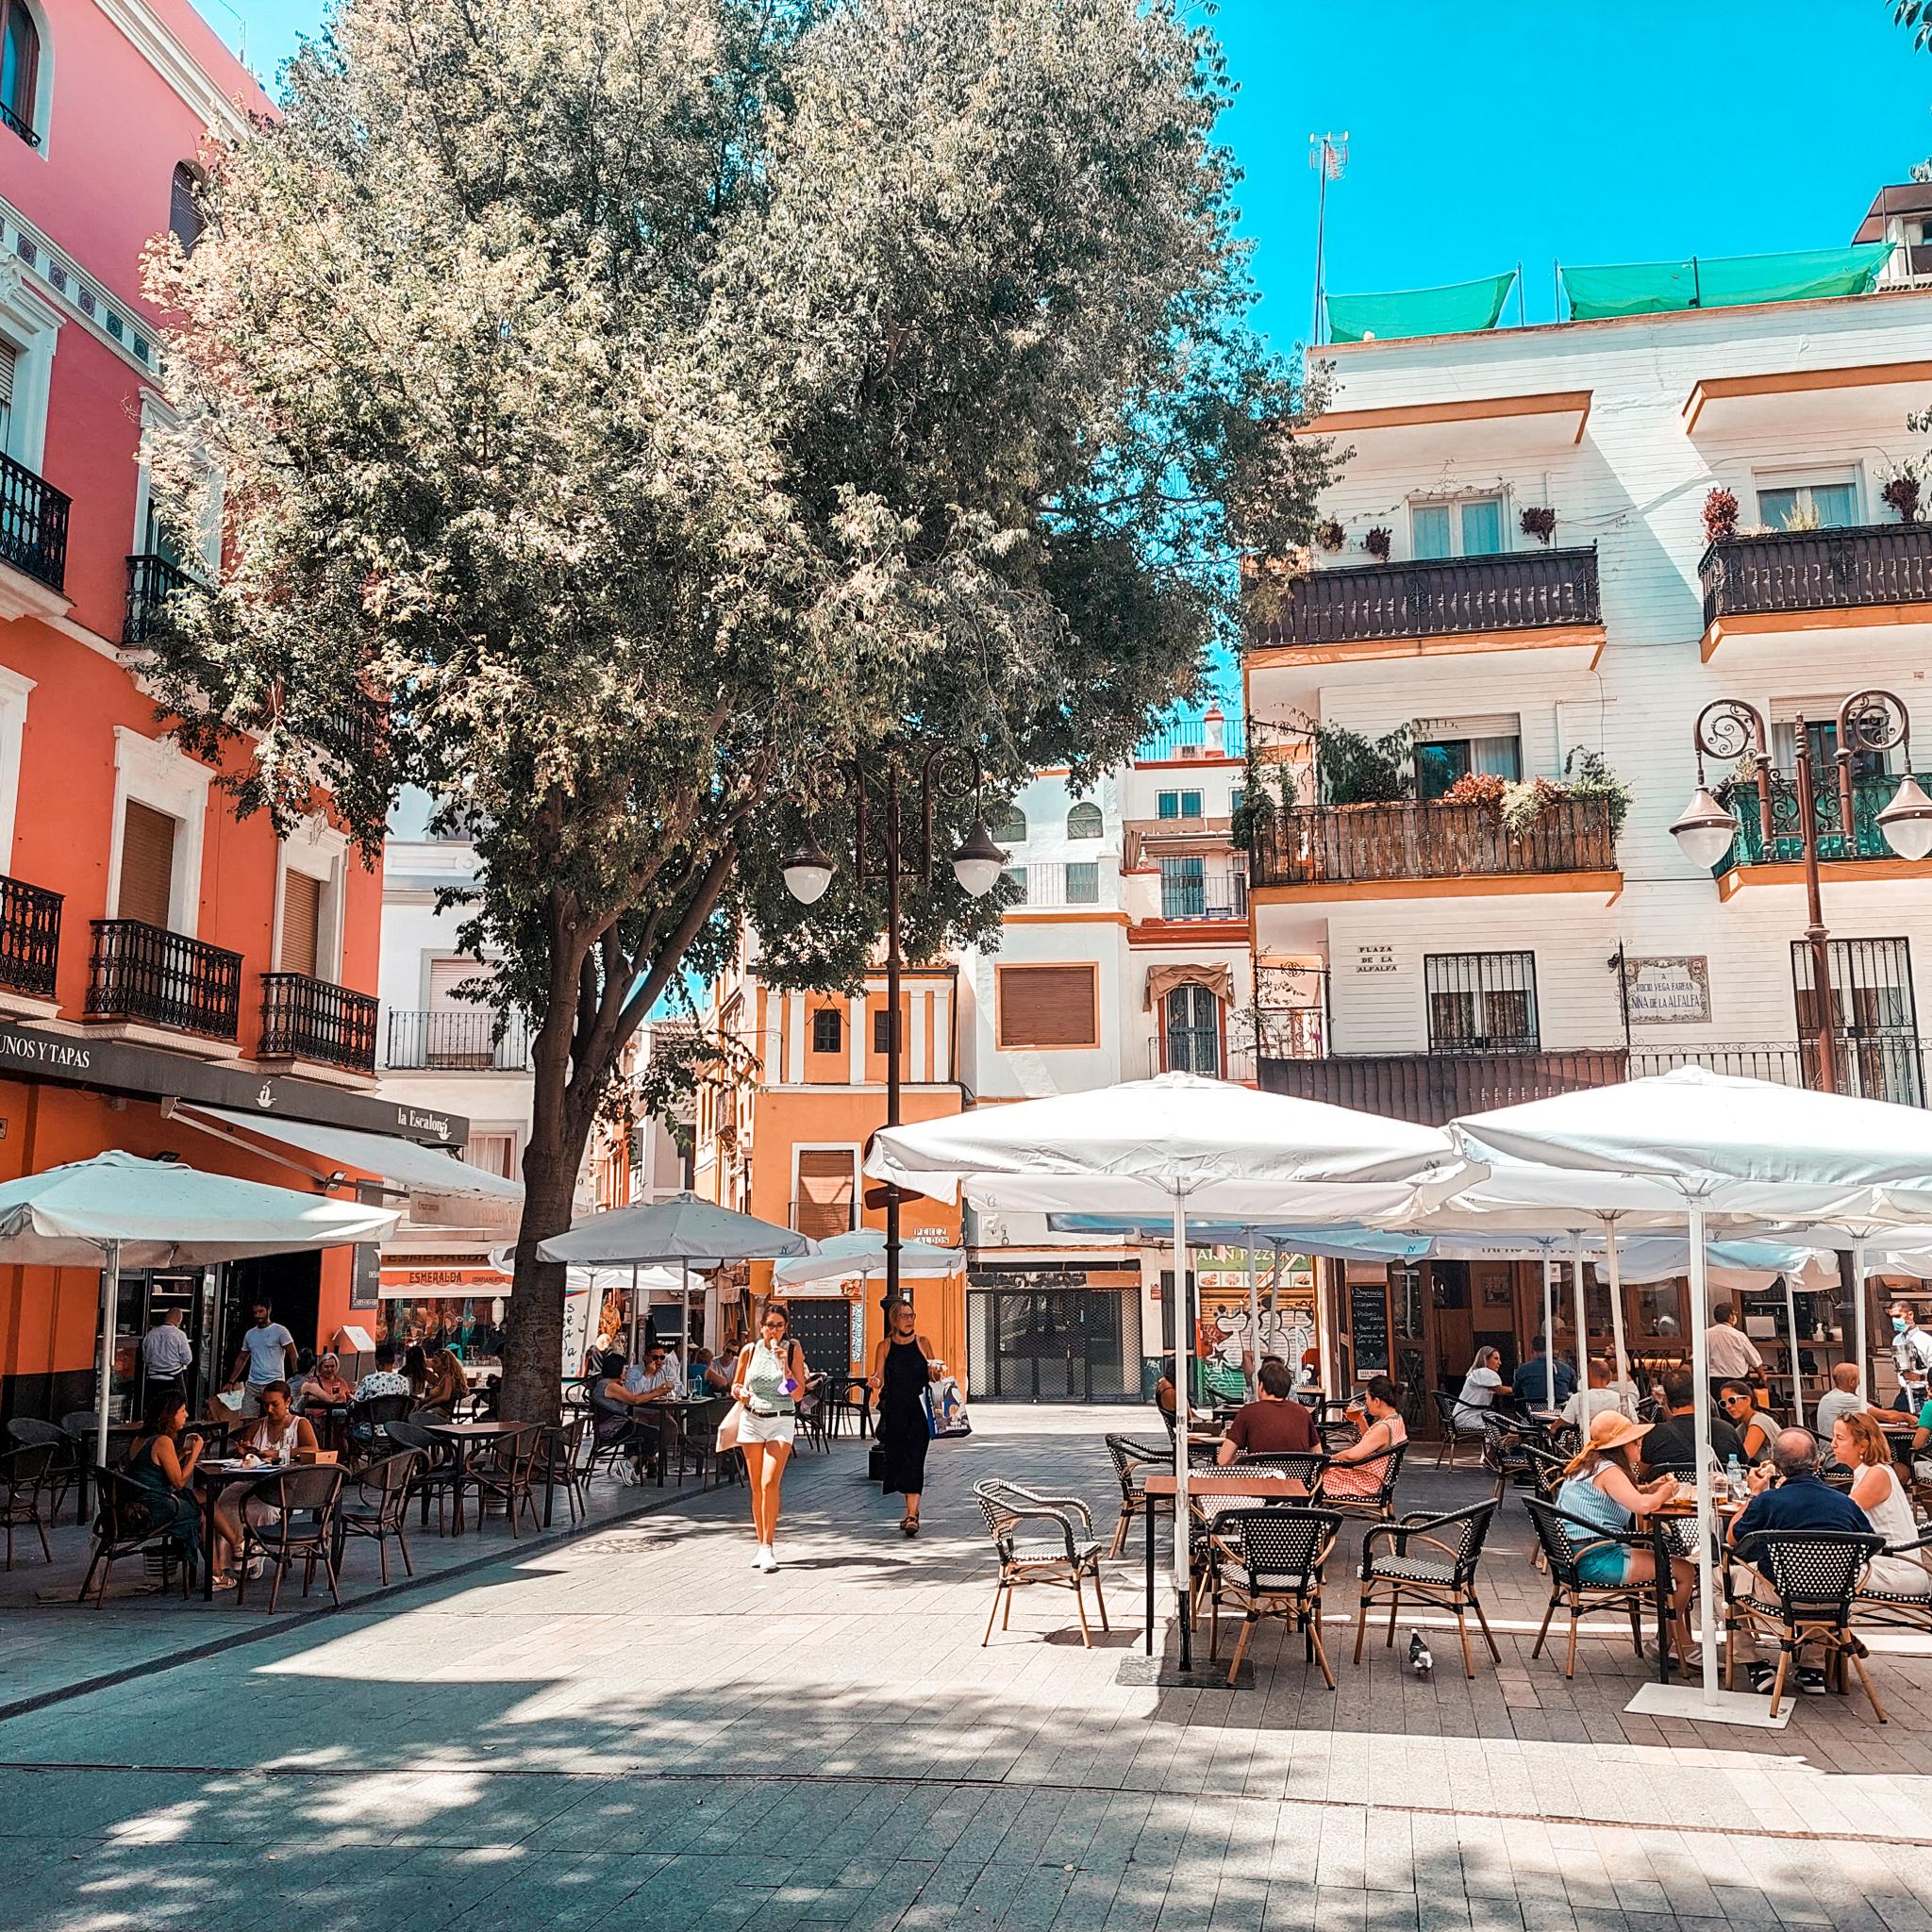 Plac Alfalfa, Sewilla, Hiszpania, Andaluzja, Place, restauracje, tapas bary